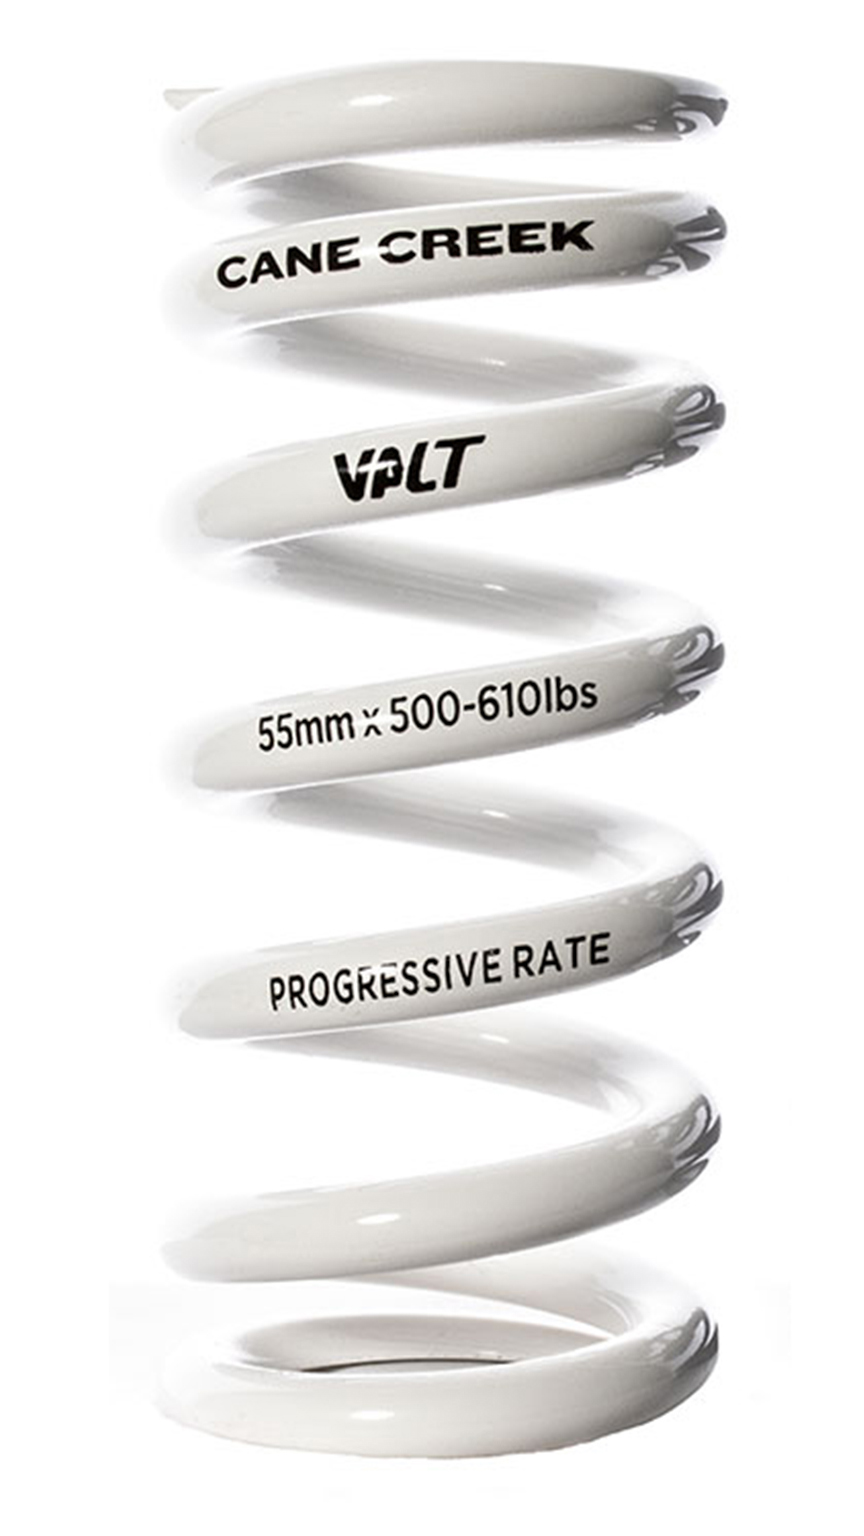 Cane Creek Progressive-Rate VALT Mountain Bike Coil Shock Spring White